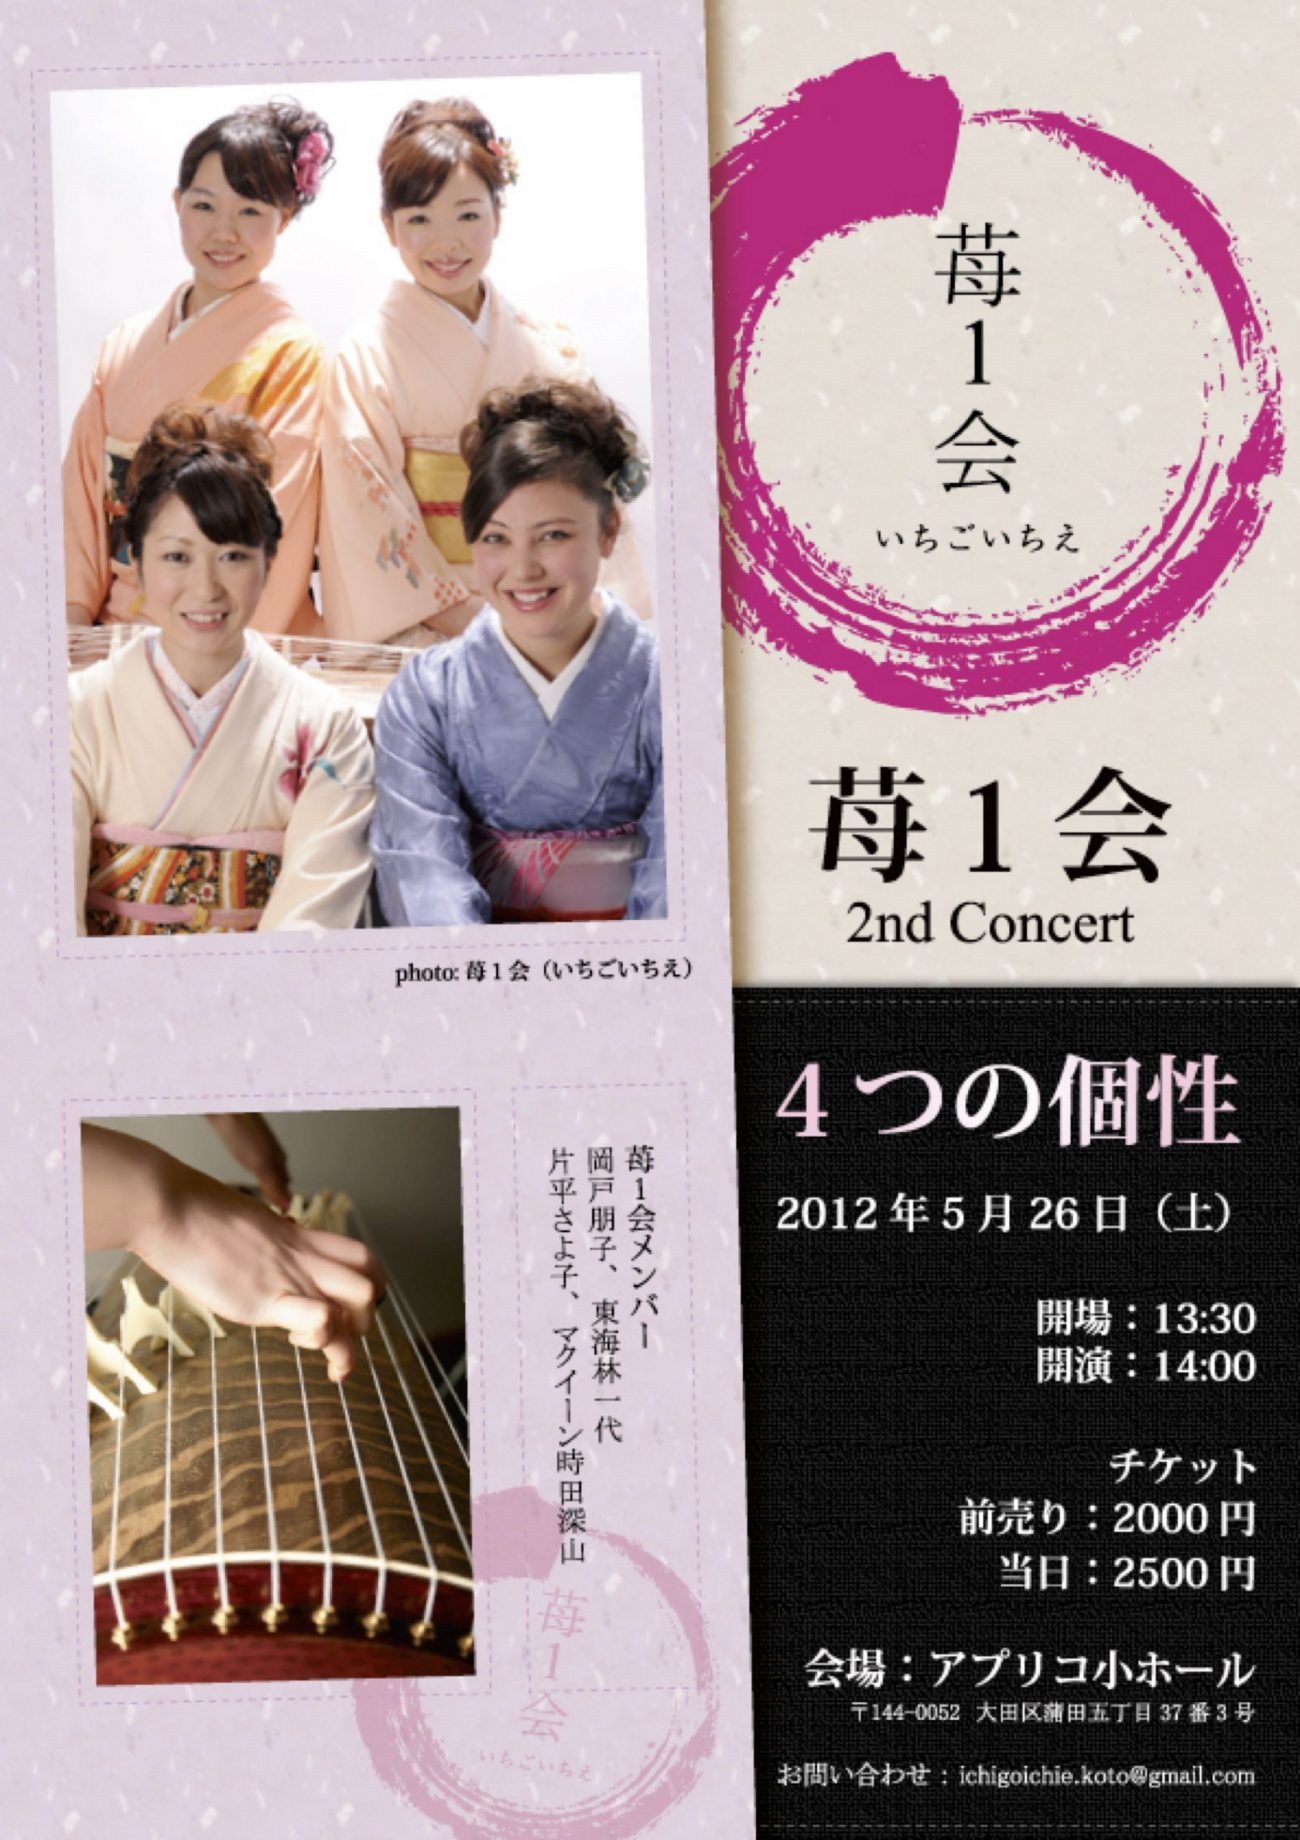 2nd Concert「4つの個性」チラシ